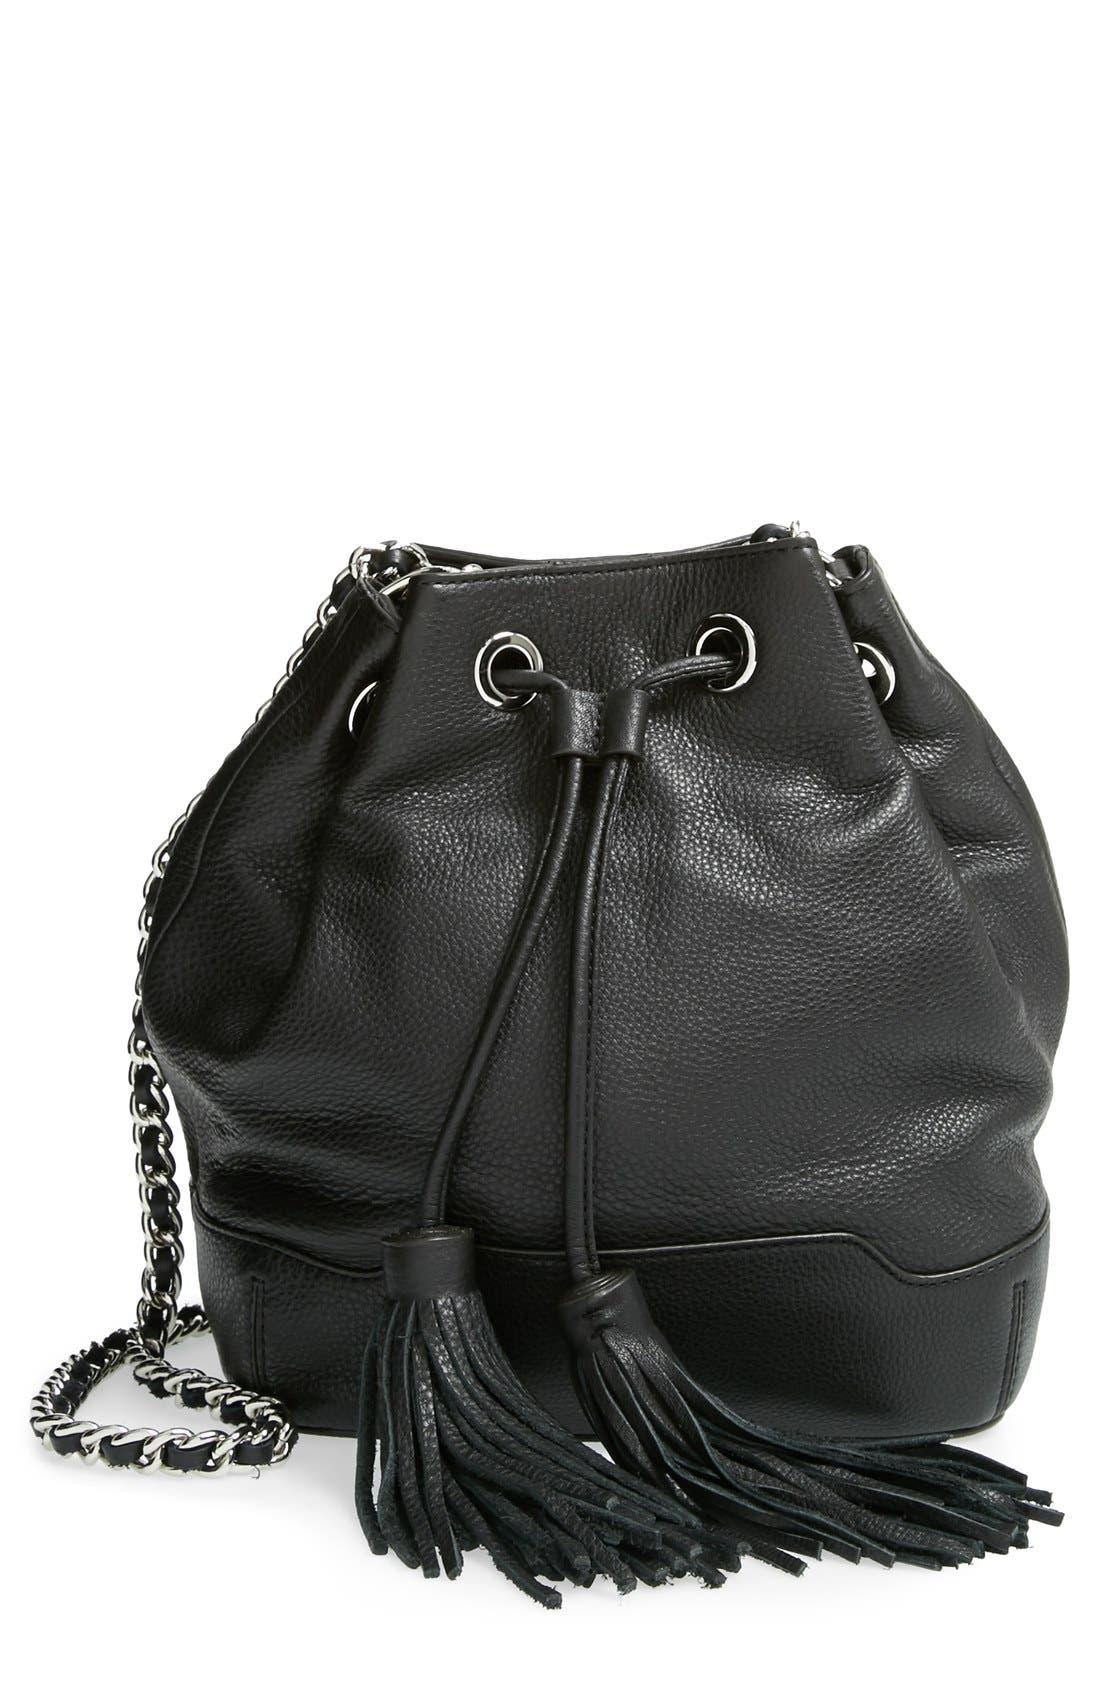 Main Image - Rebecca Minkoff 'Lexi' Convertible Bucket Bag